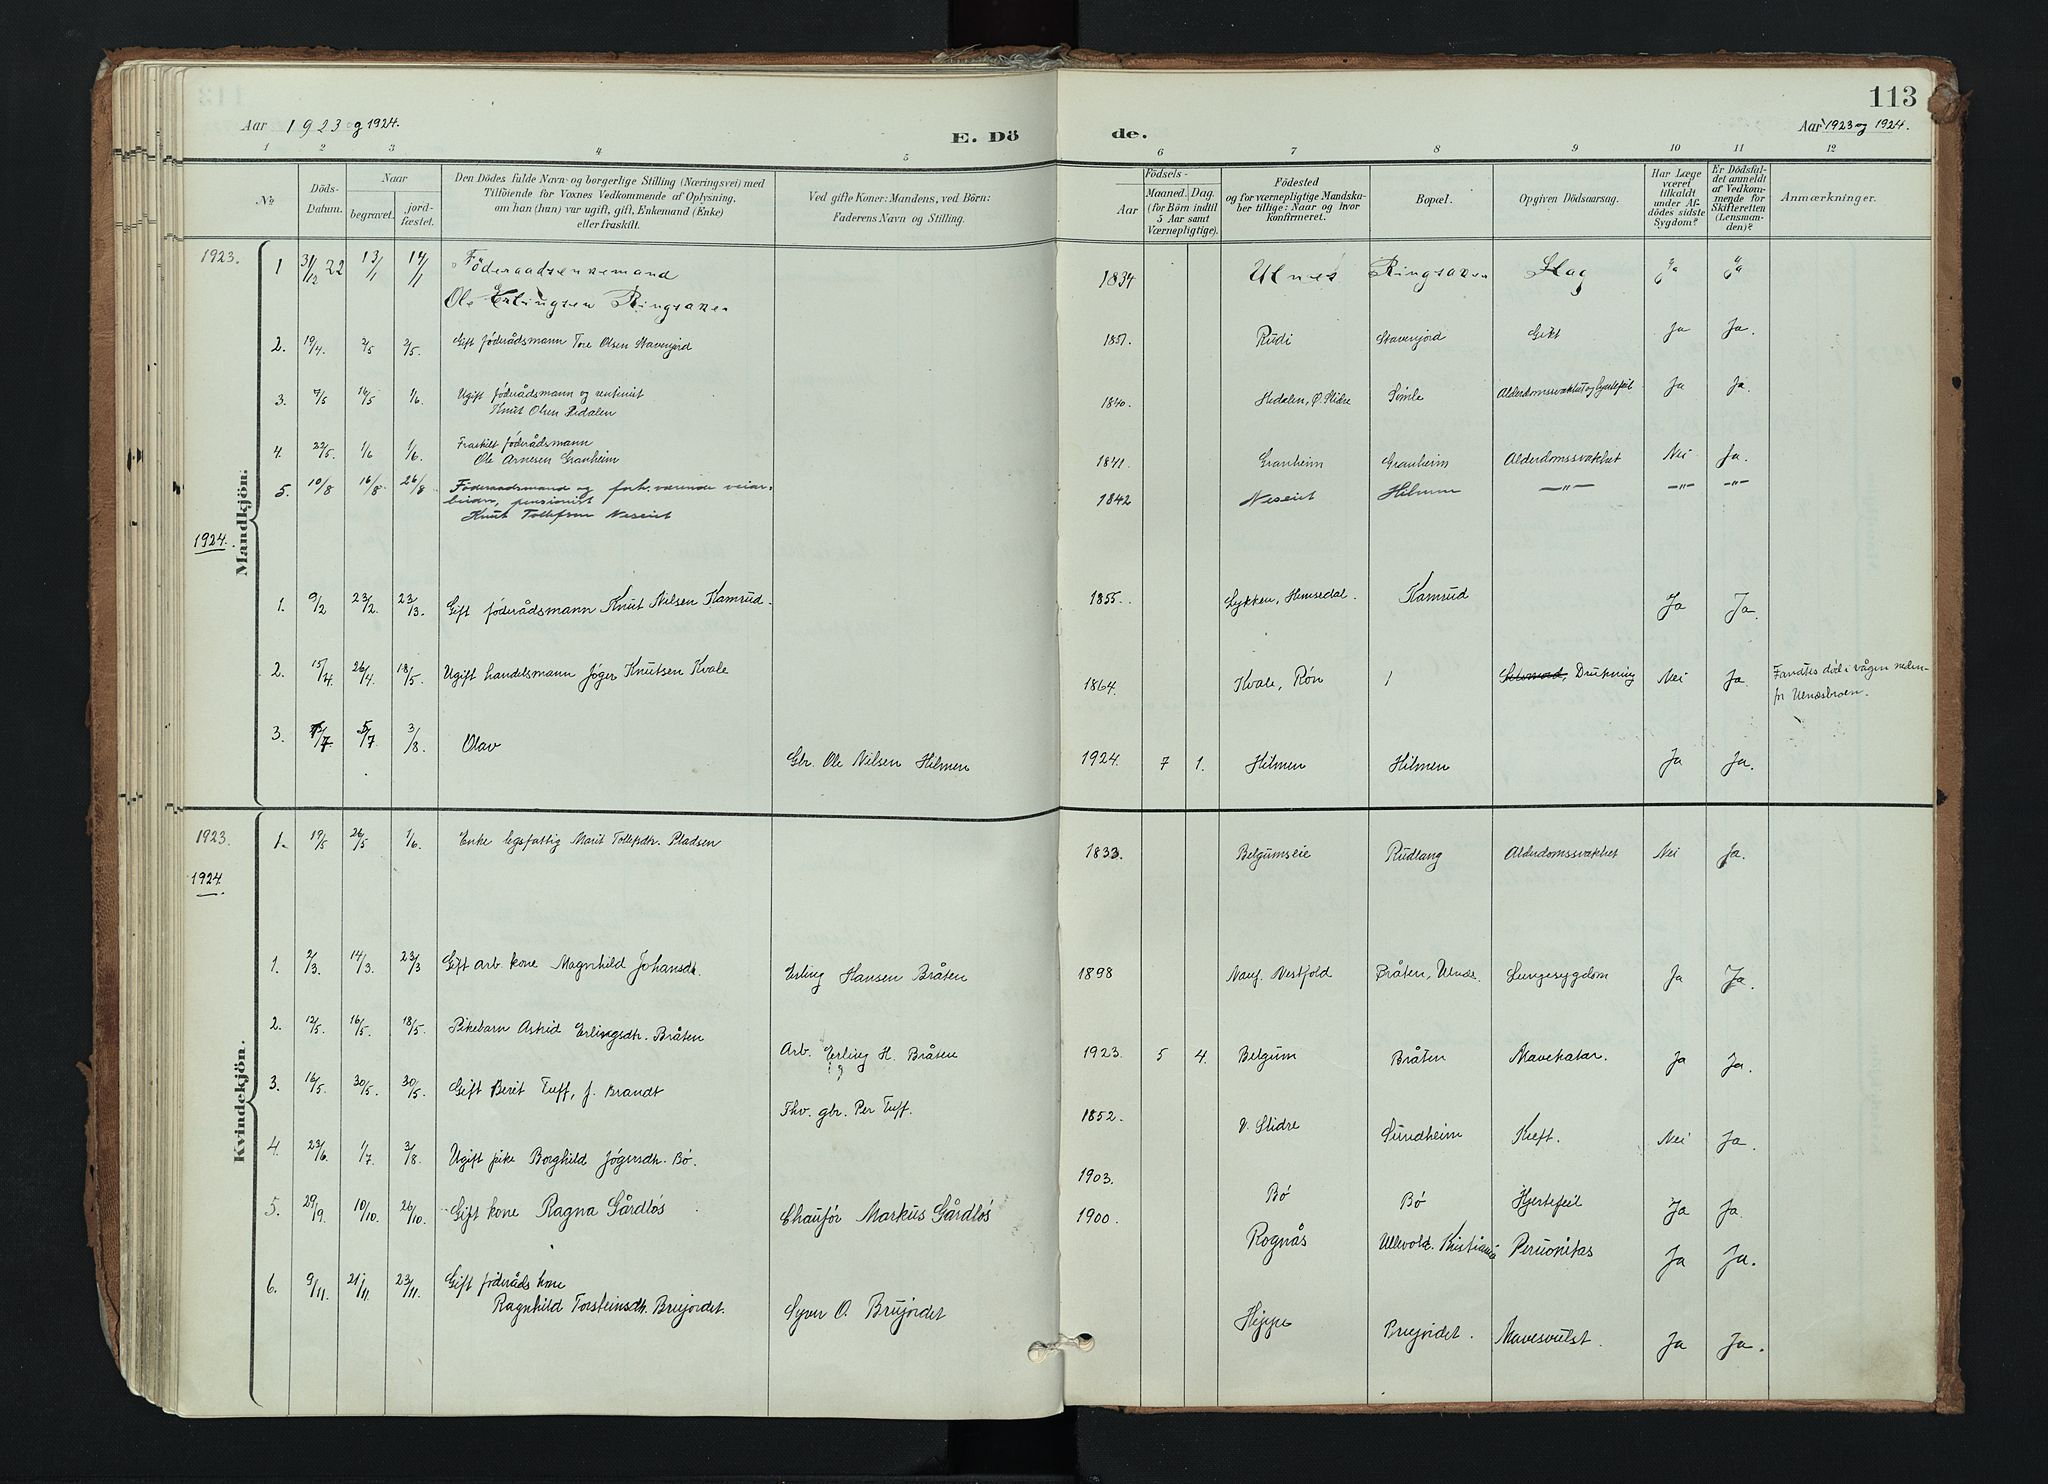 SAH, Nord-Aurdal prestekontor, Ministerialbok nr. 17, 1897-1926, s. 113